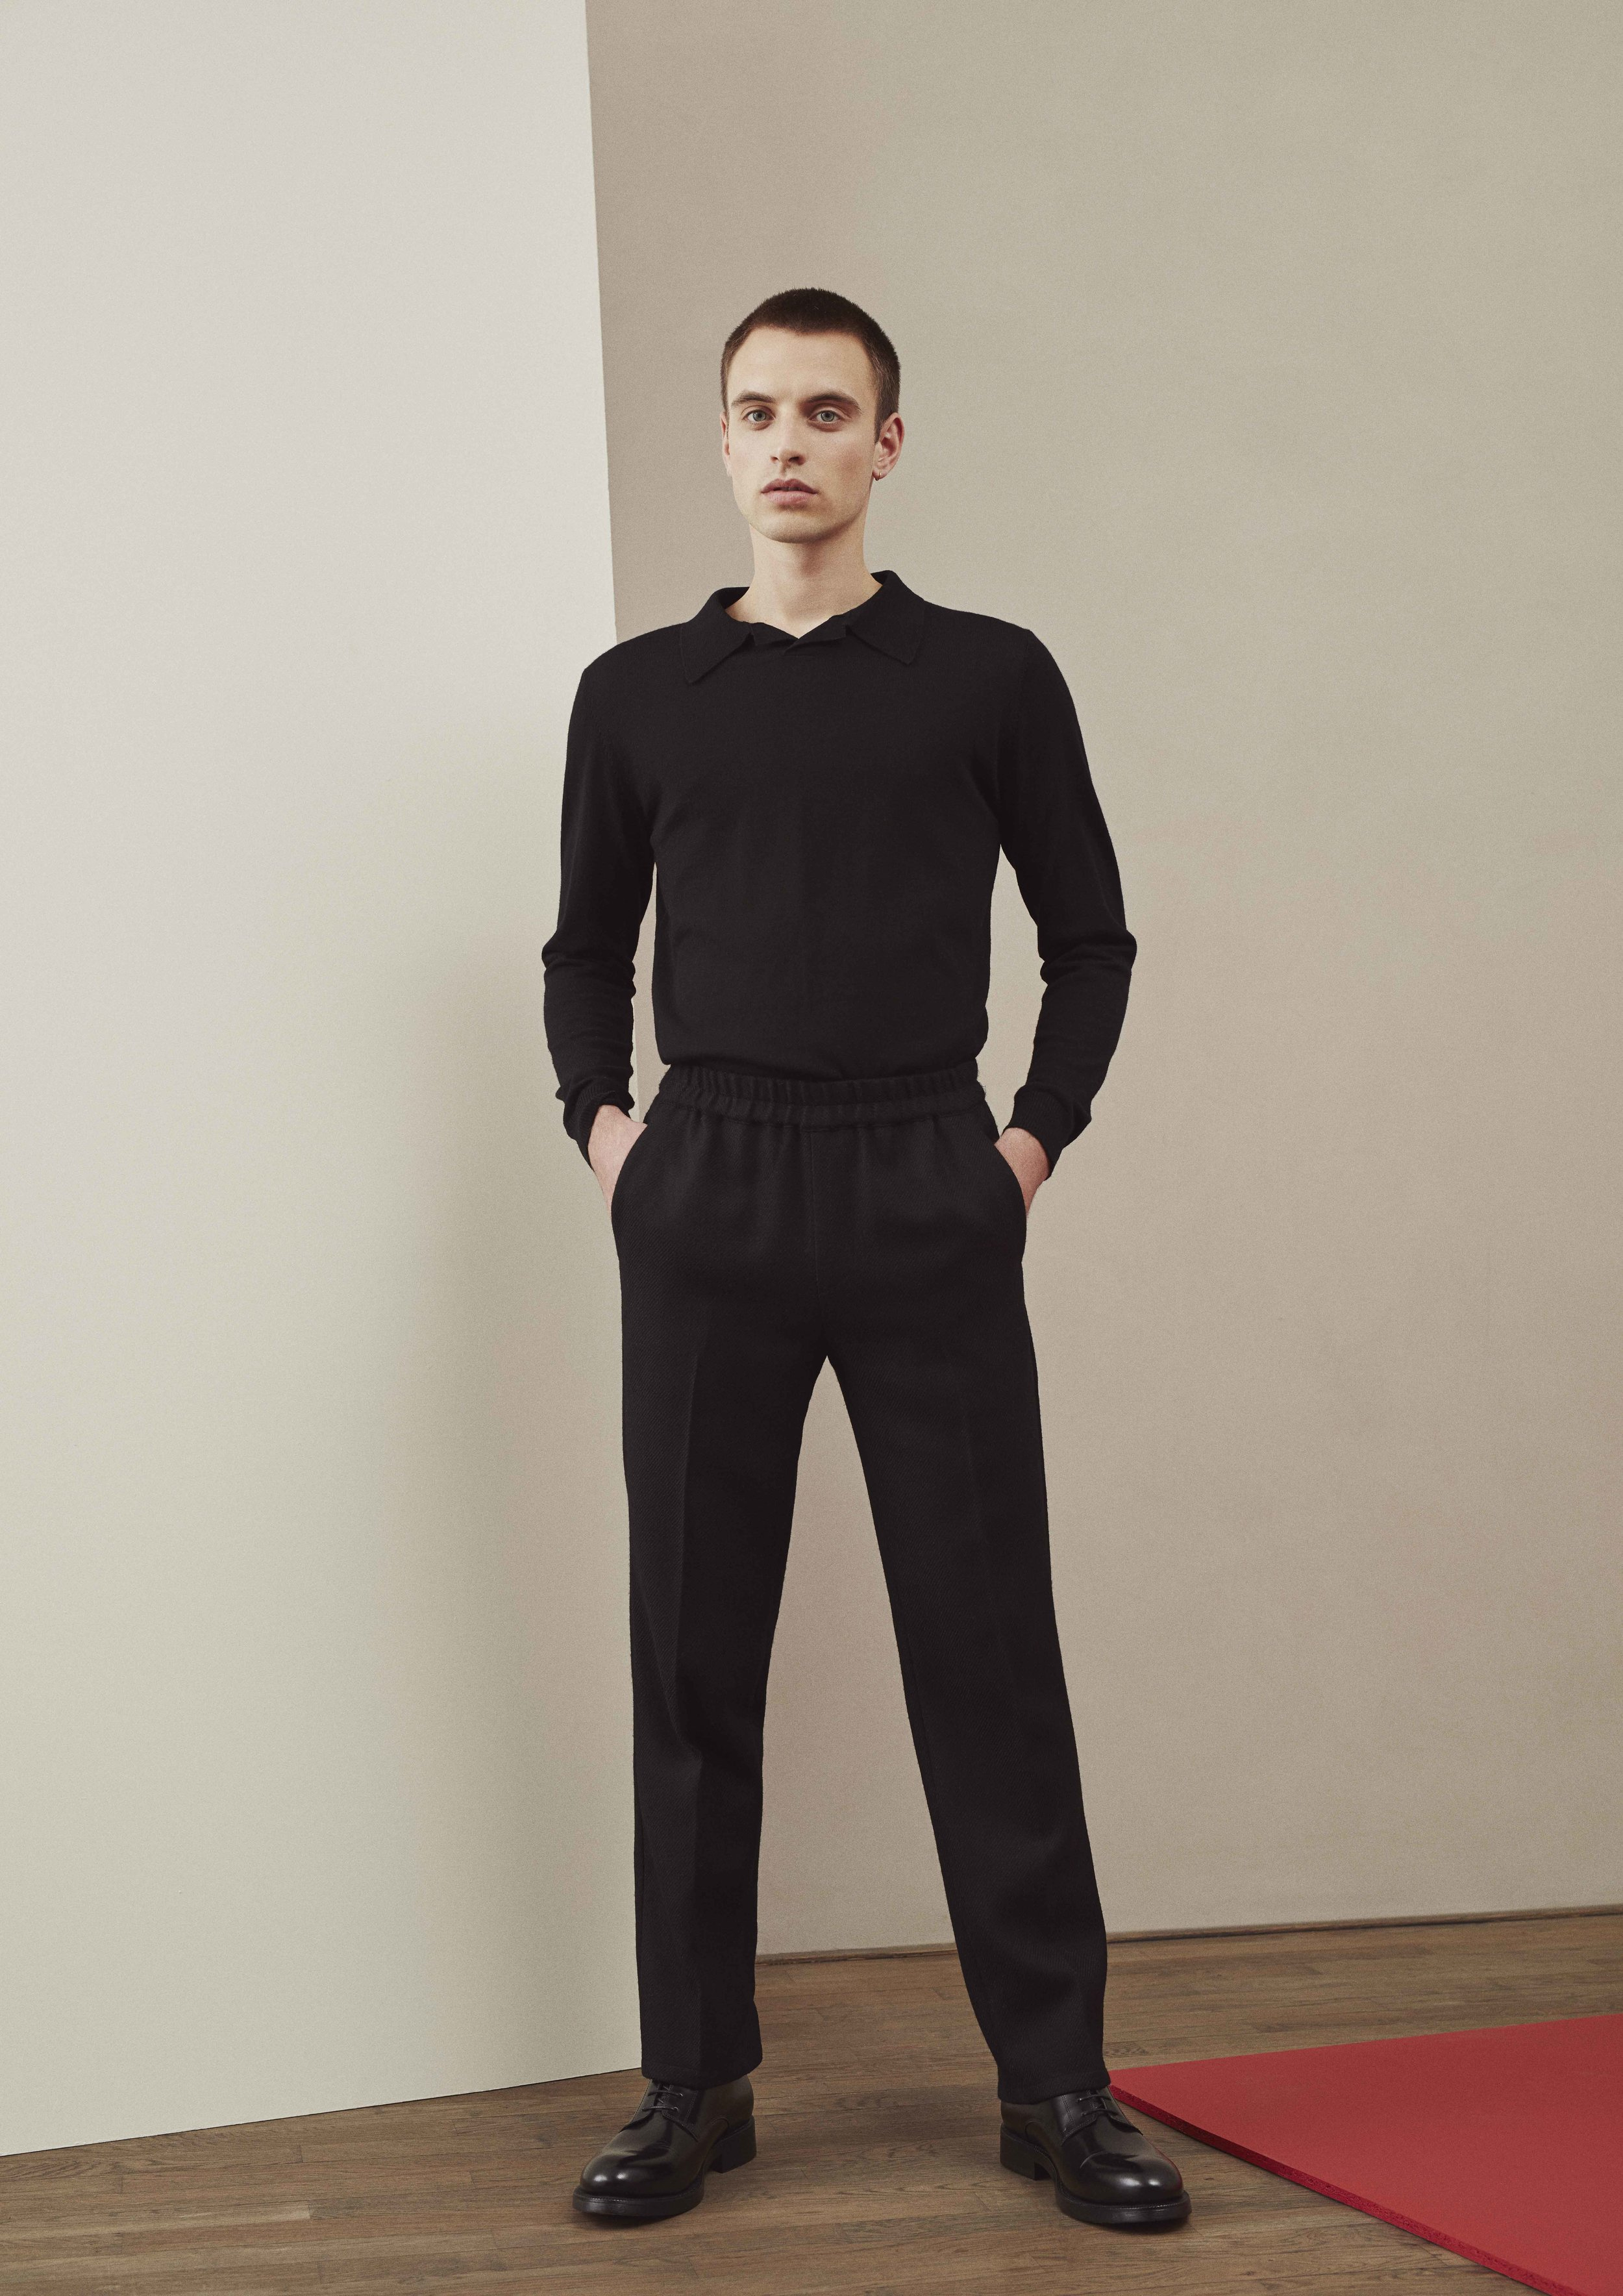 <b>3</b><br>Amos Wool Sweater<br>Felix Highland Wool Pants